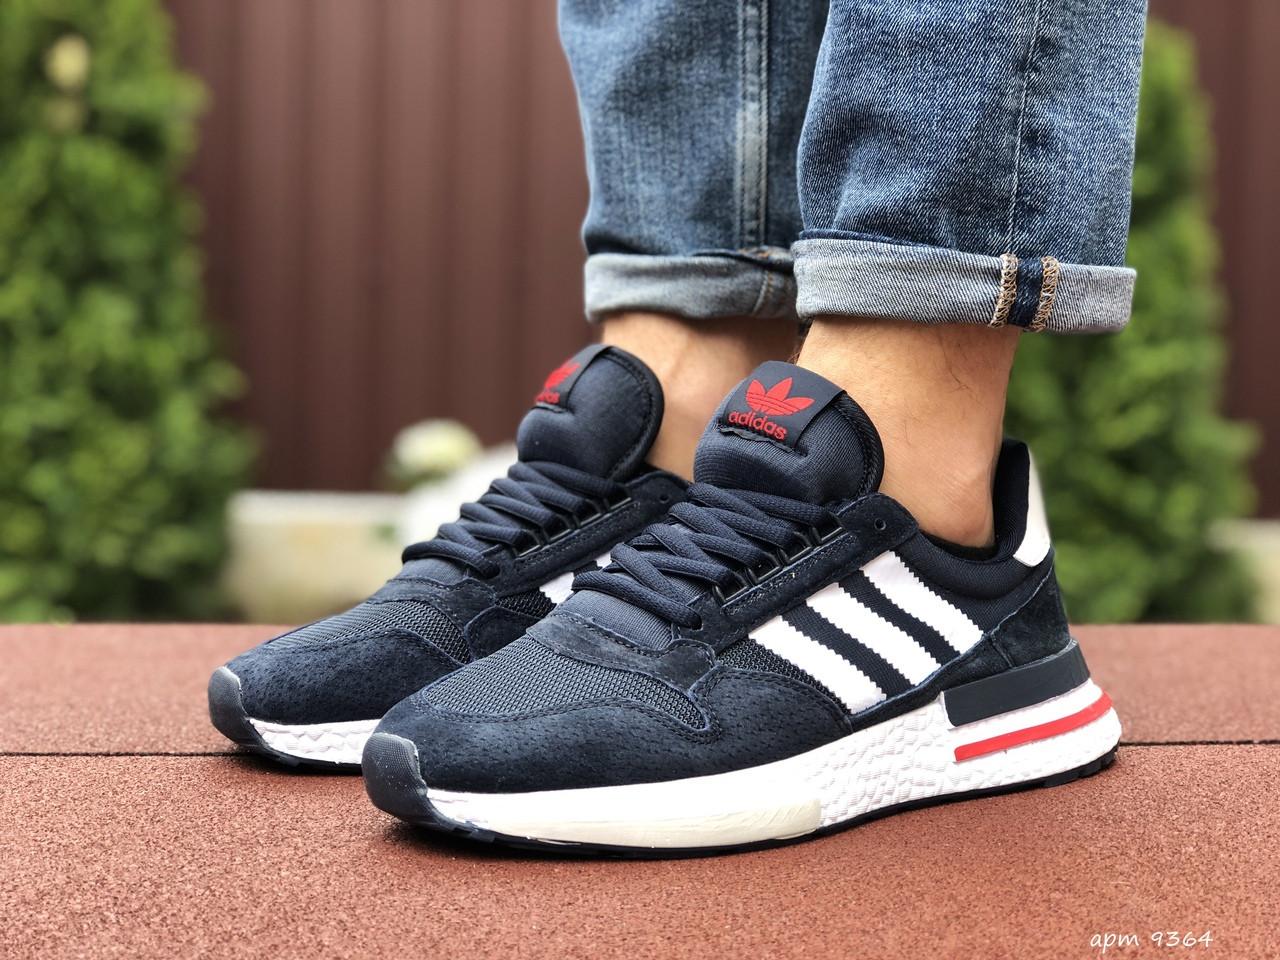 Мужские кроссовки Adidas Zx 500 Rm (темно-синие с белым) 9364